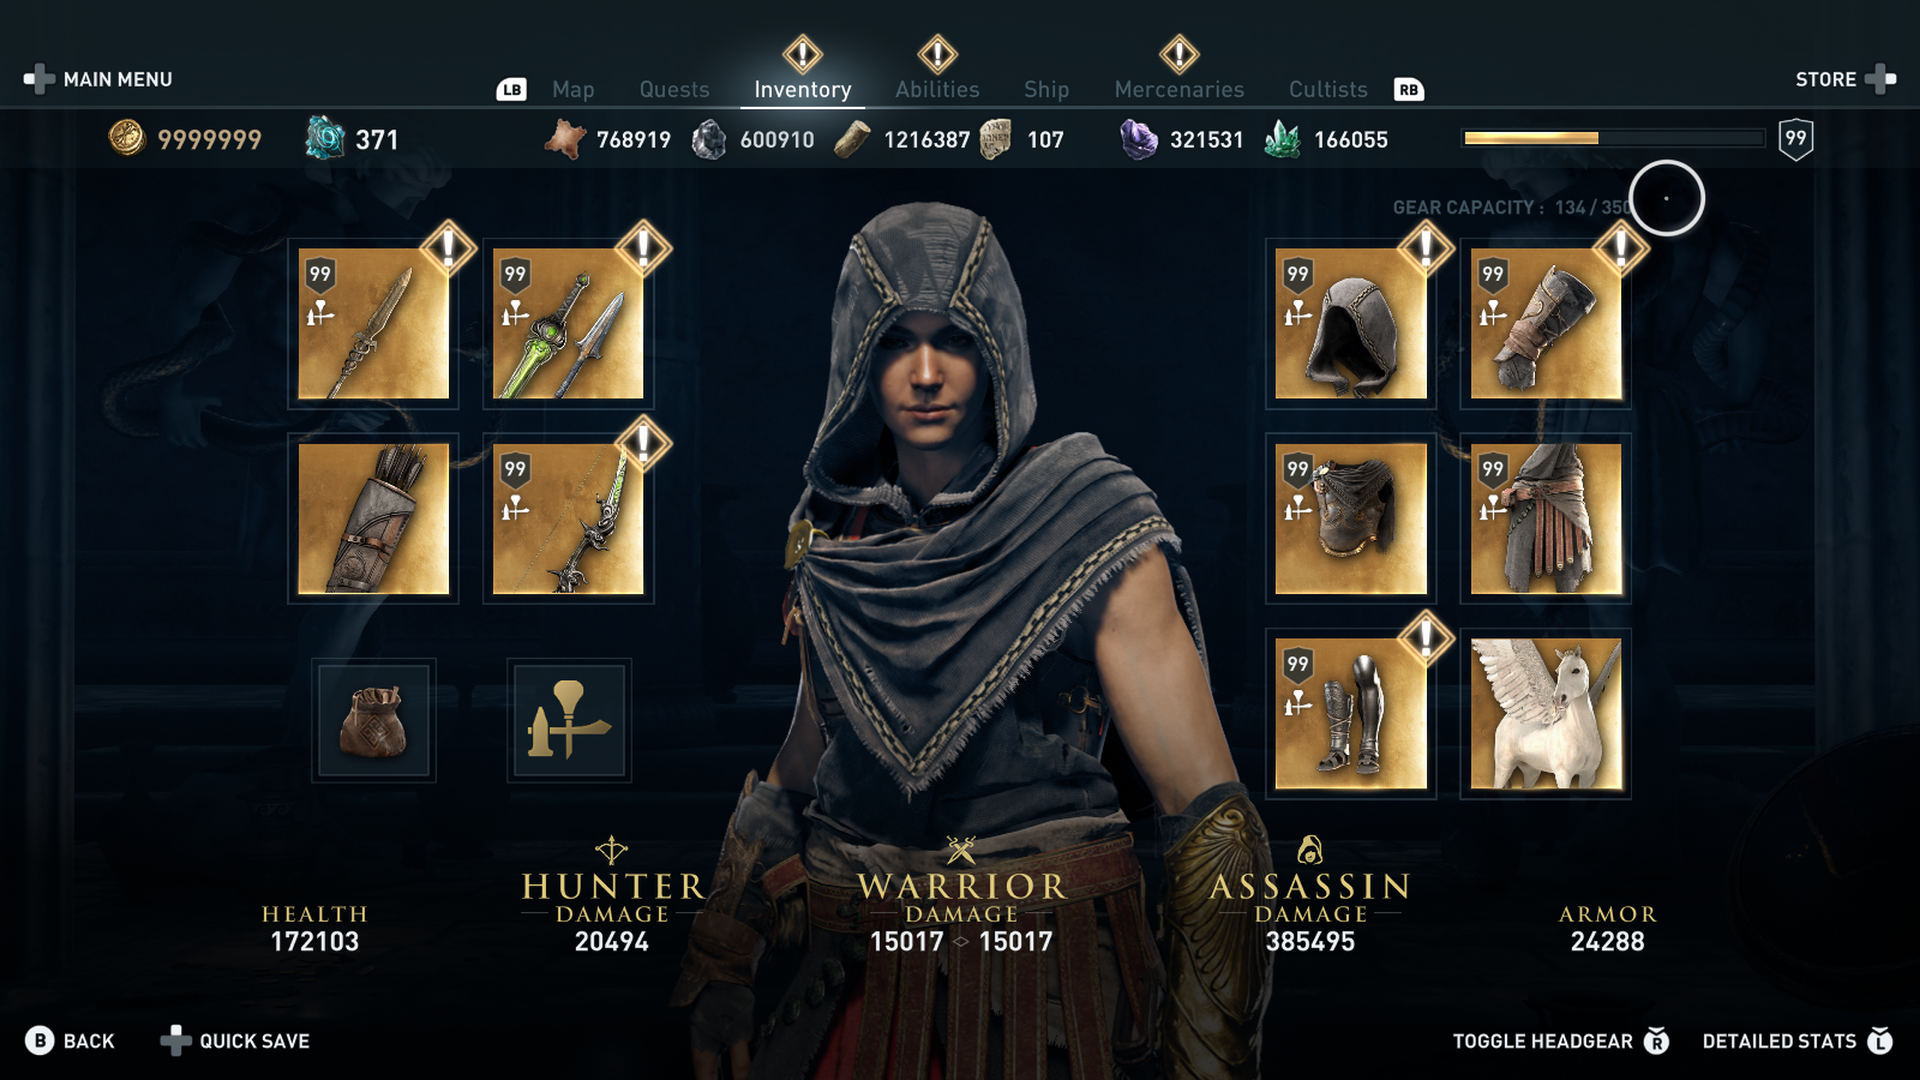 Hunter armor penetration minimum